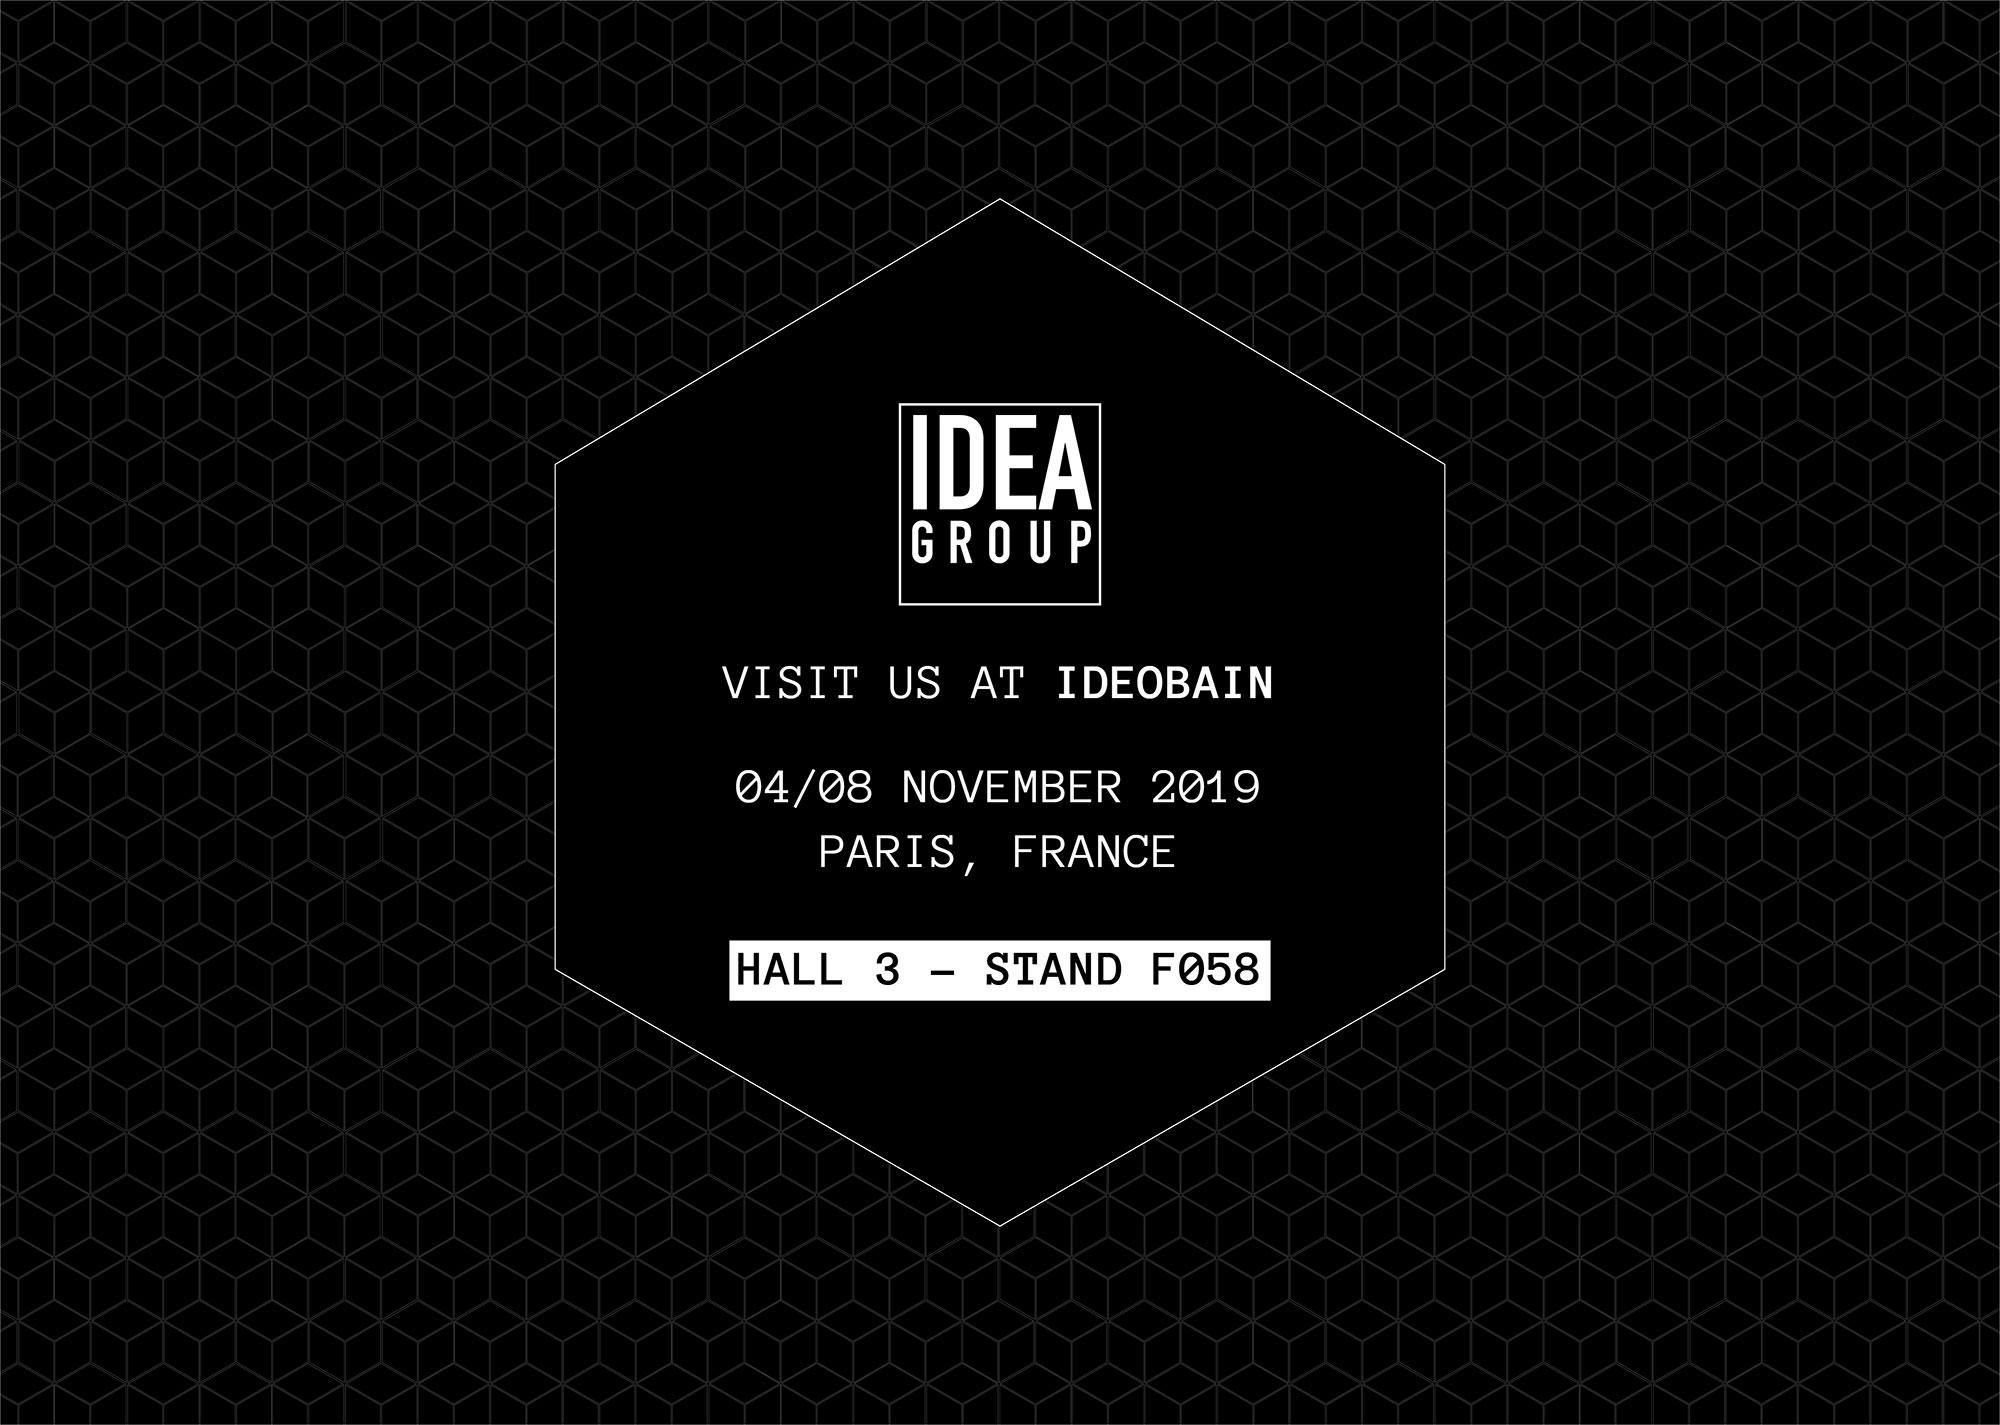 Ideagroup en la Feria Idéobain 2019